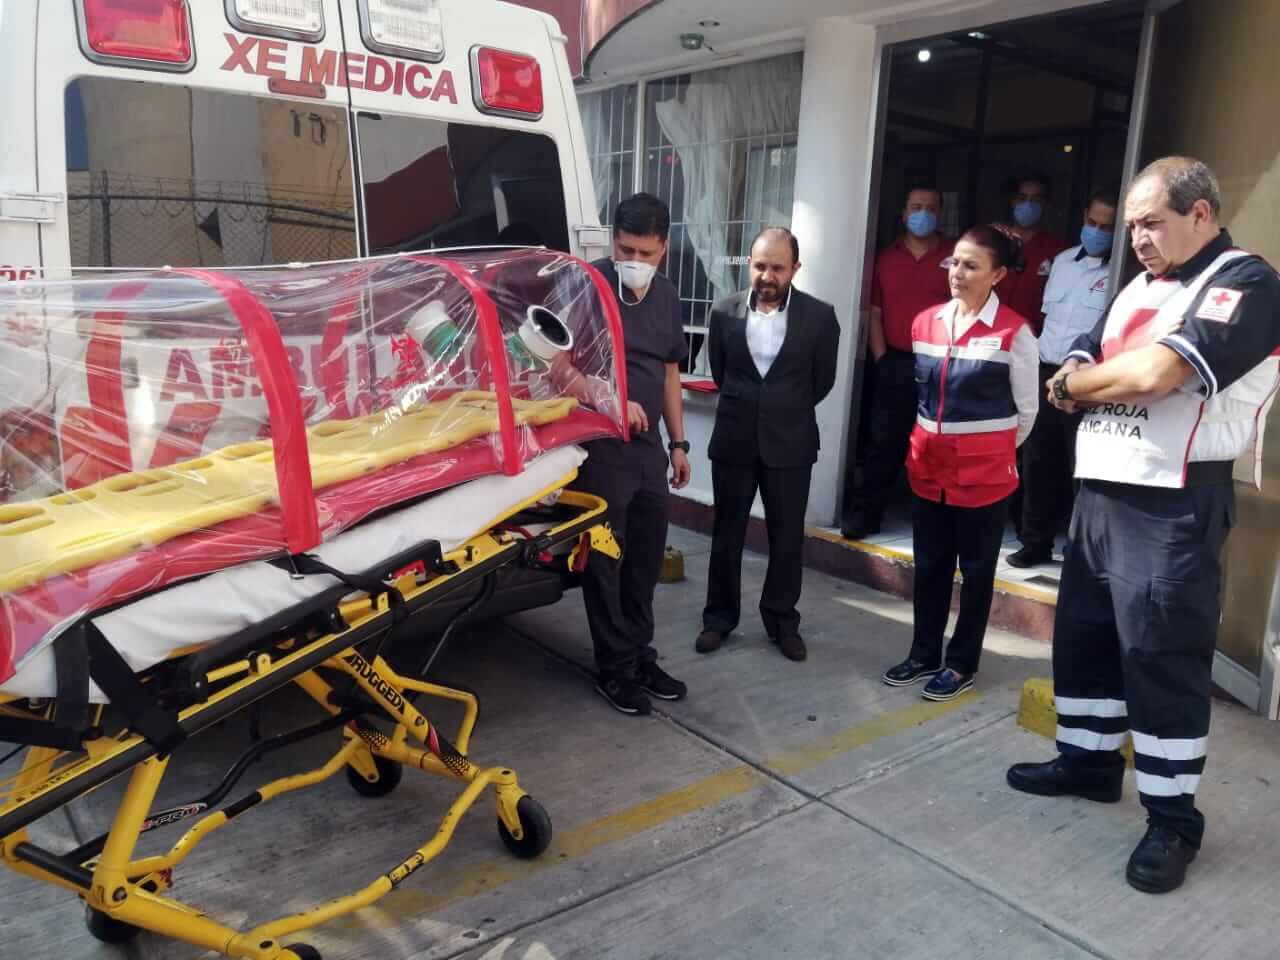 Dona XE Médica a Cruz Roja Mexicana cápsula de aislamiento para traslado de pacientes de COVID-19